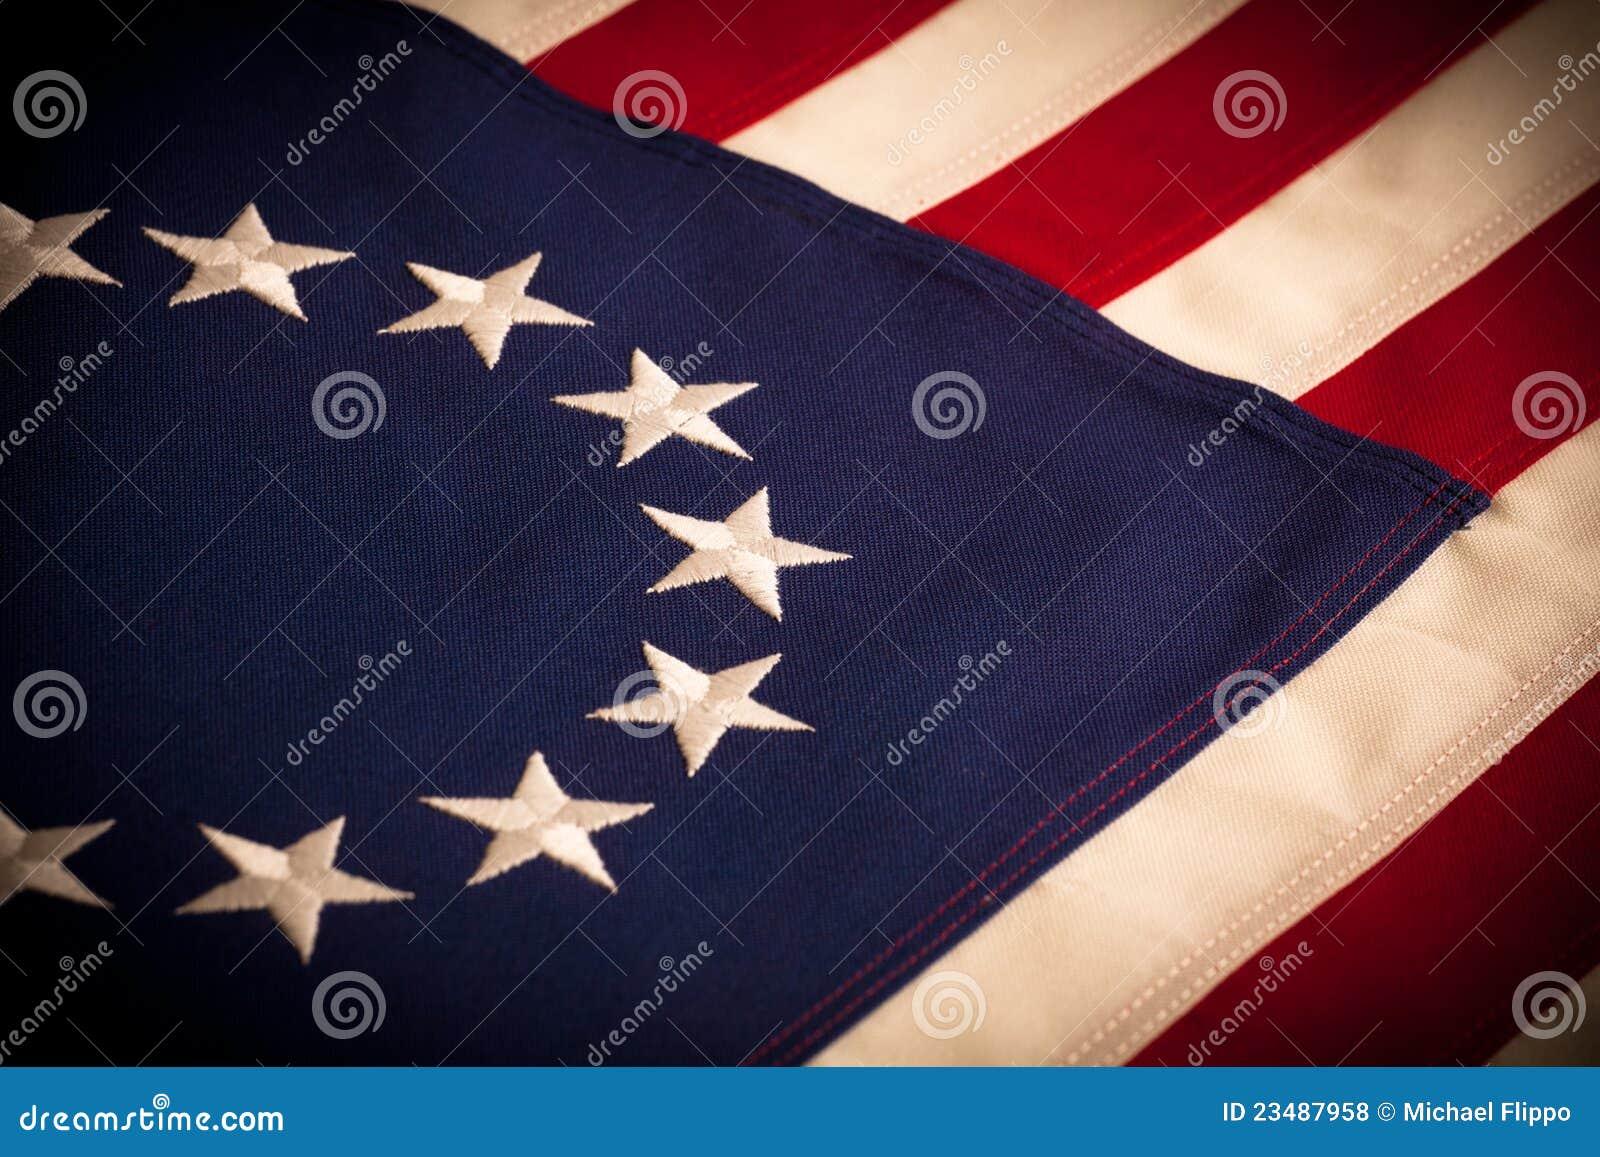 4b50338560c0 Betsy Ross - 13 Star American Flag Stock Photo - Image of americana ...